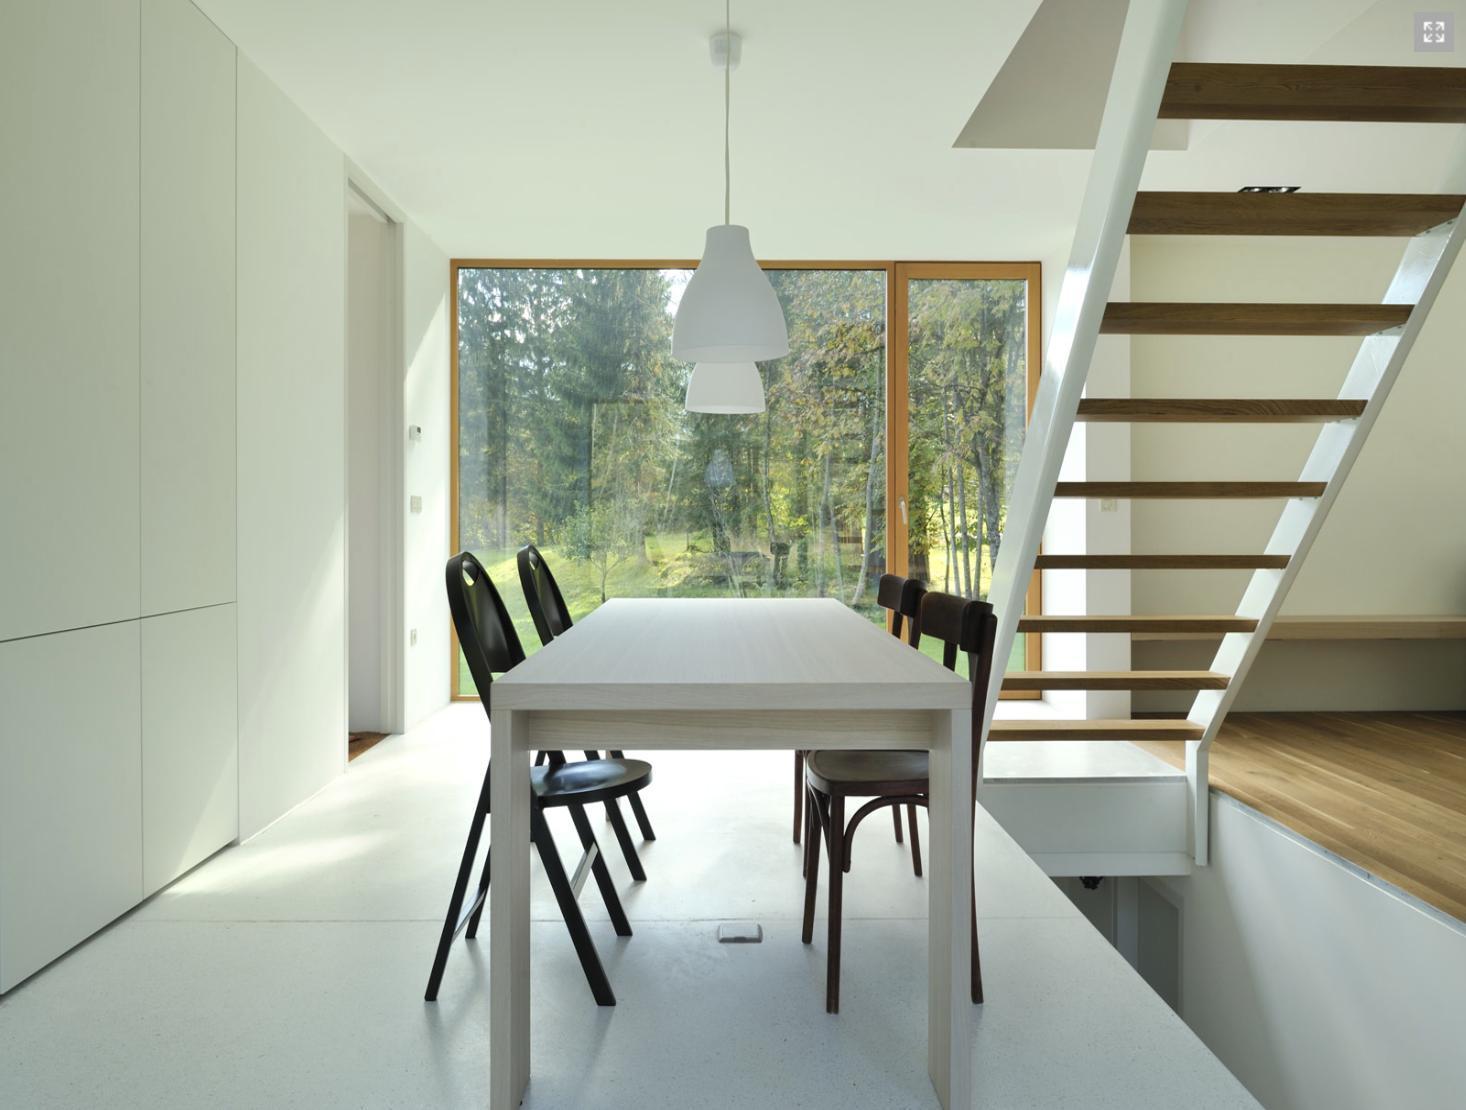 Lesena hiša R, minimalistični interier.